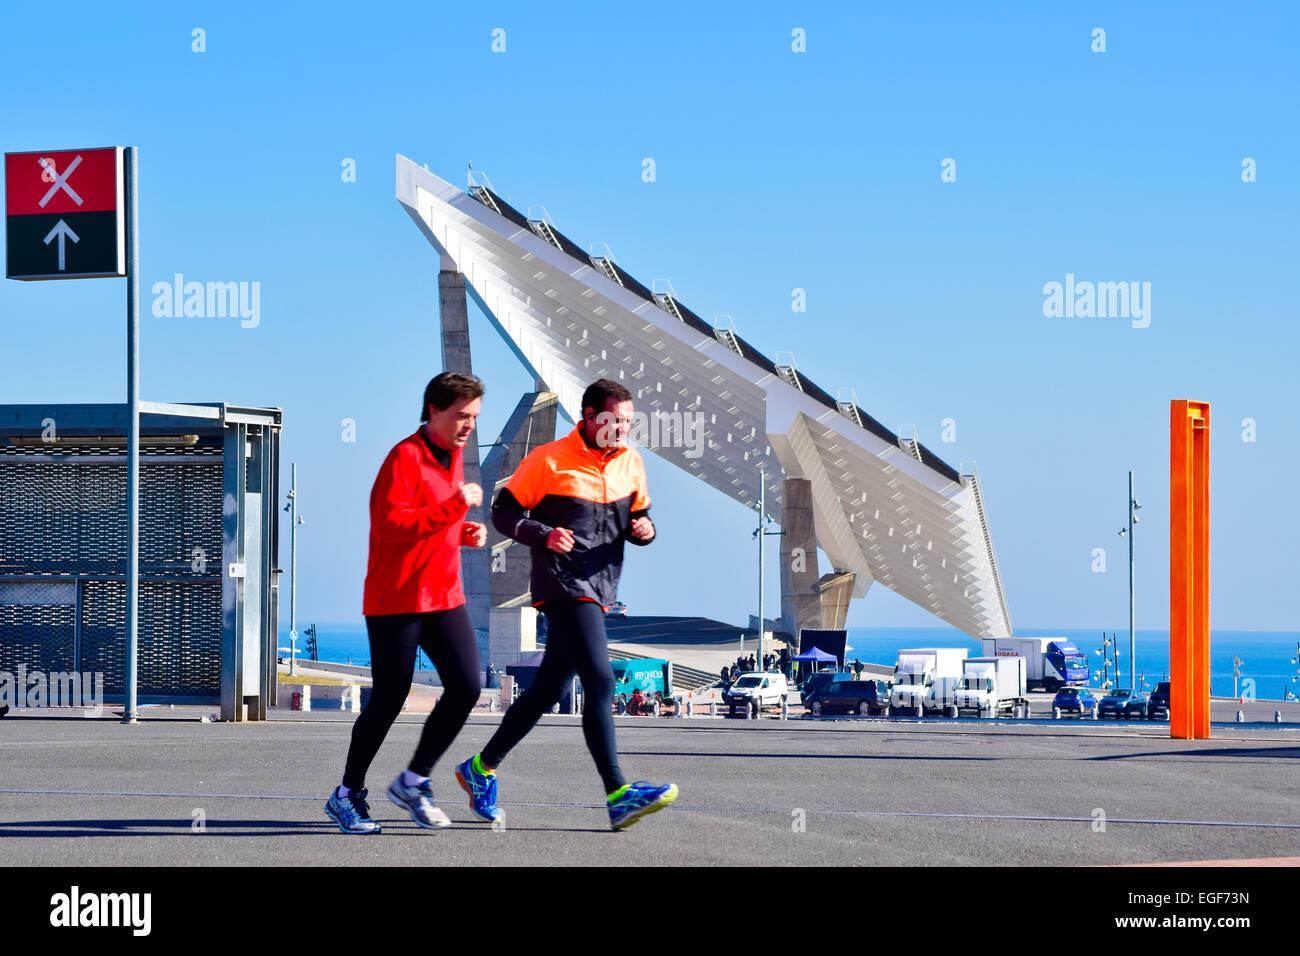 Two runners at Forum. Photovoltaic pergola, Forum,  Diagonal Mar area, Barcelona. Catalonia, Spain. - Stock Image